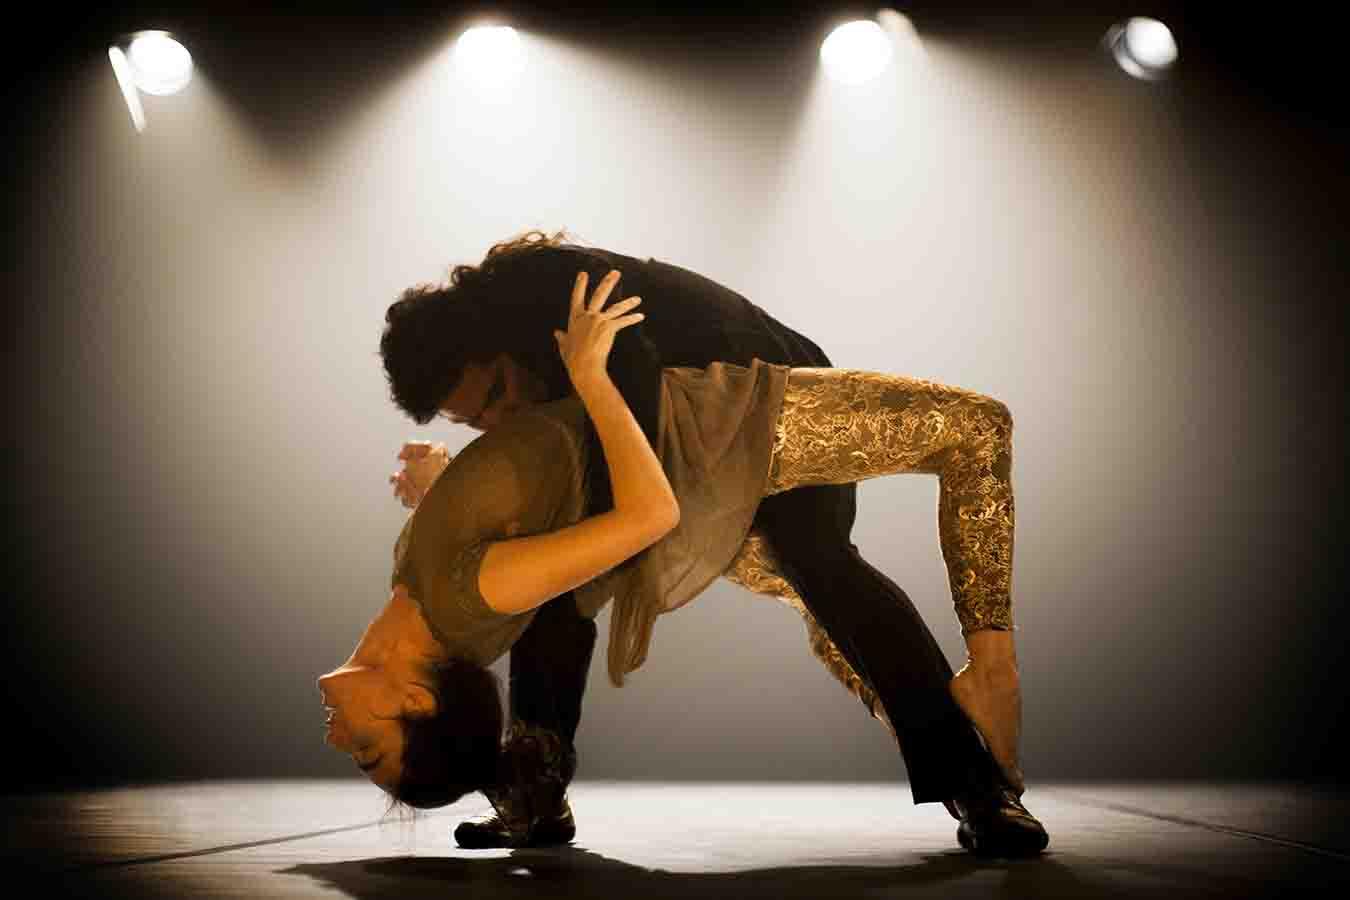 Maria Kong dancers in Open Source © Alexander Sherbakov